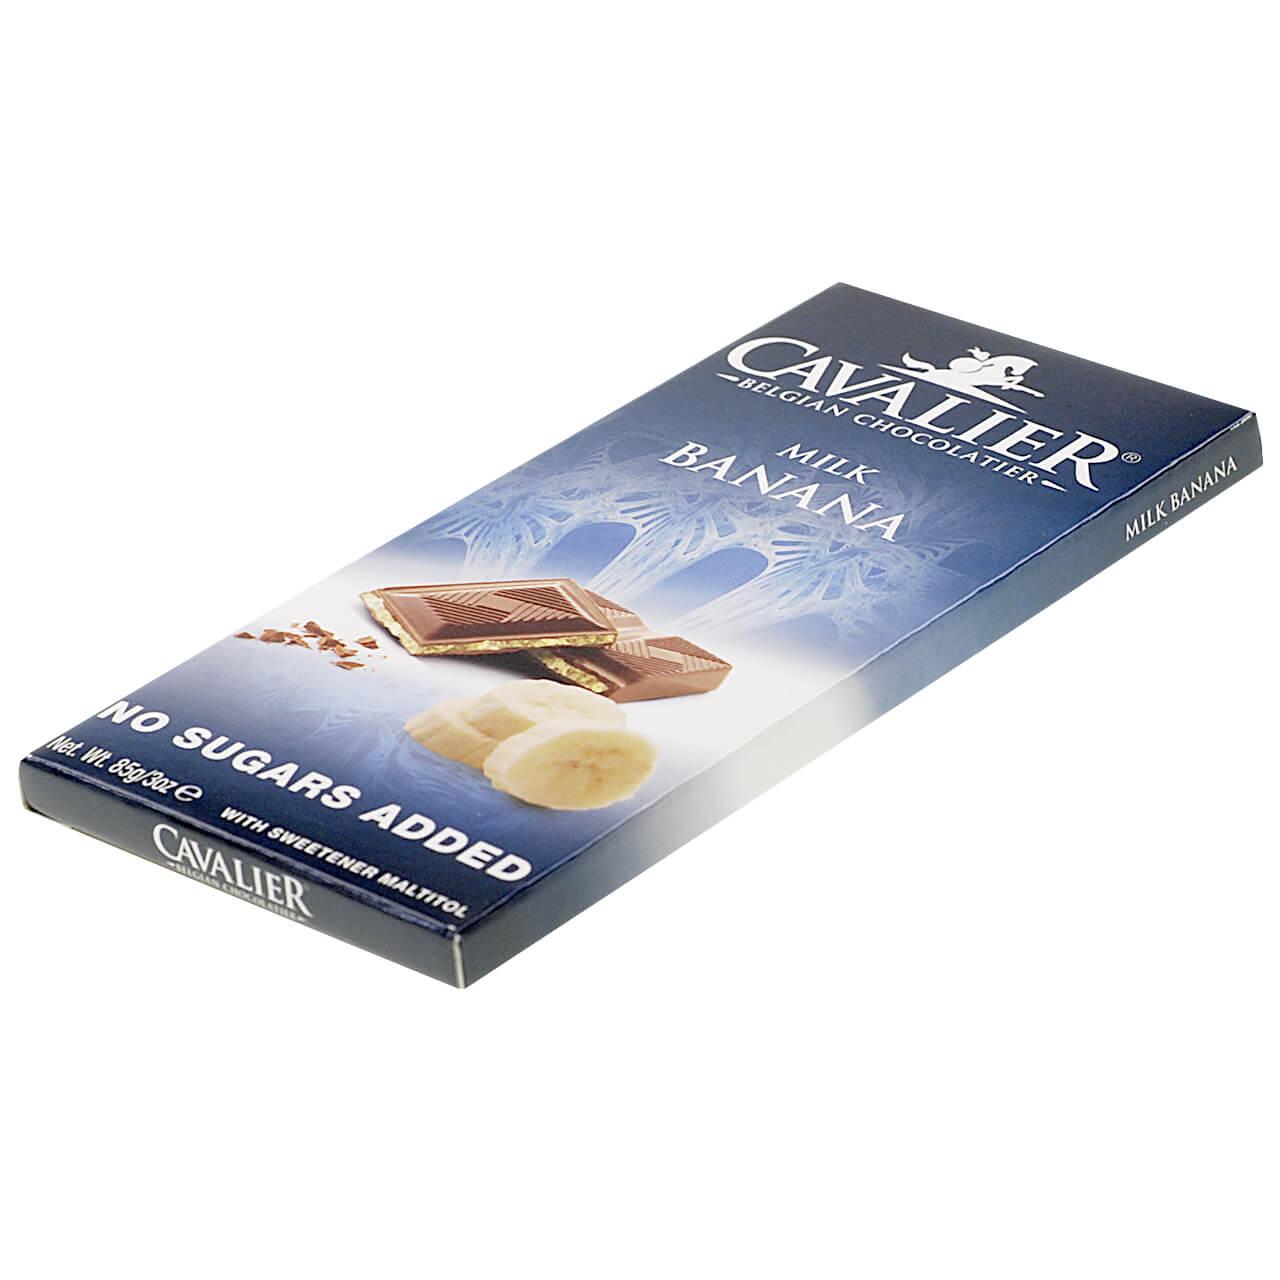 "Cavalier Schokolade ""Milch Banane"" 85 g"